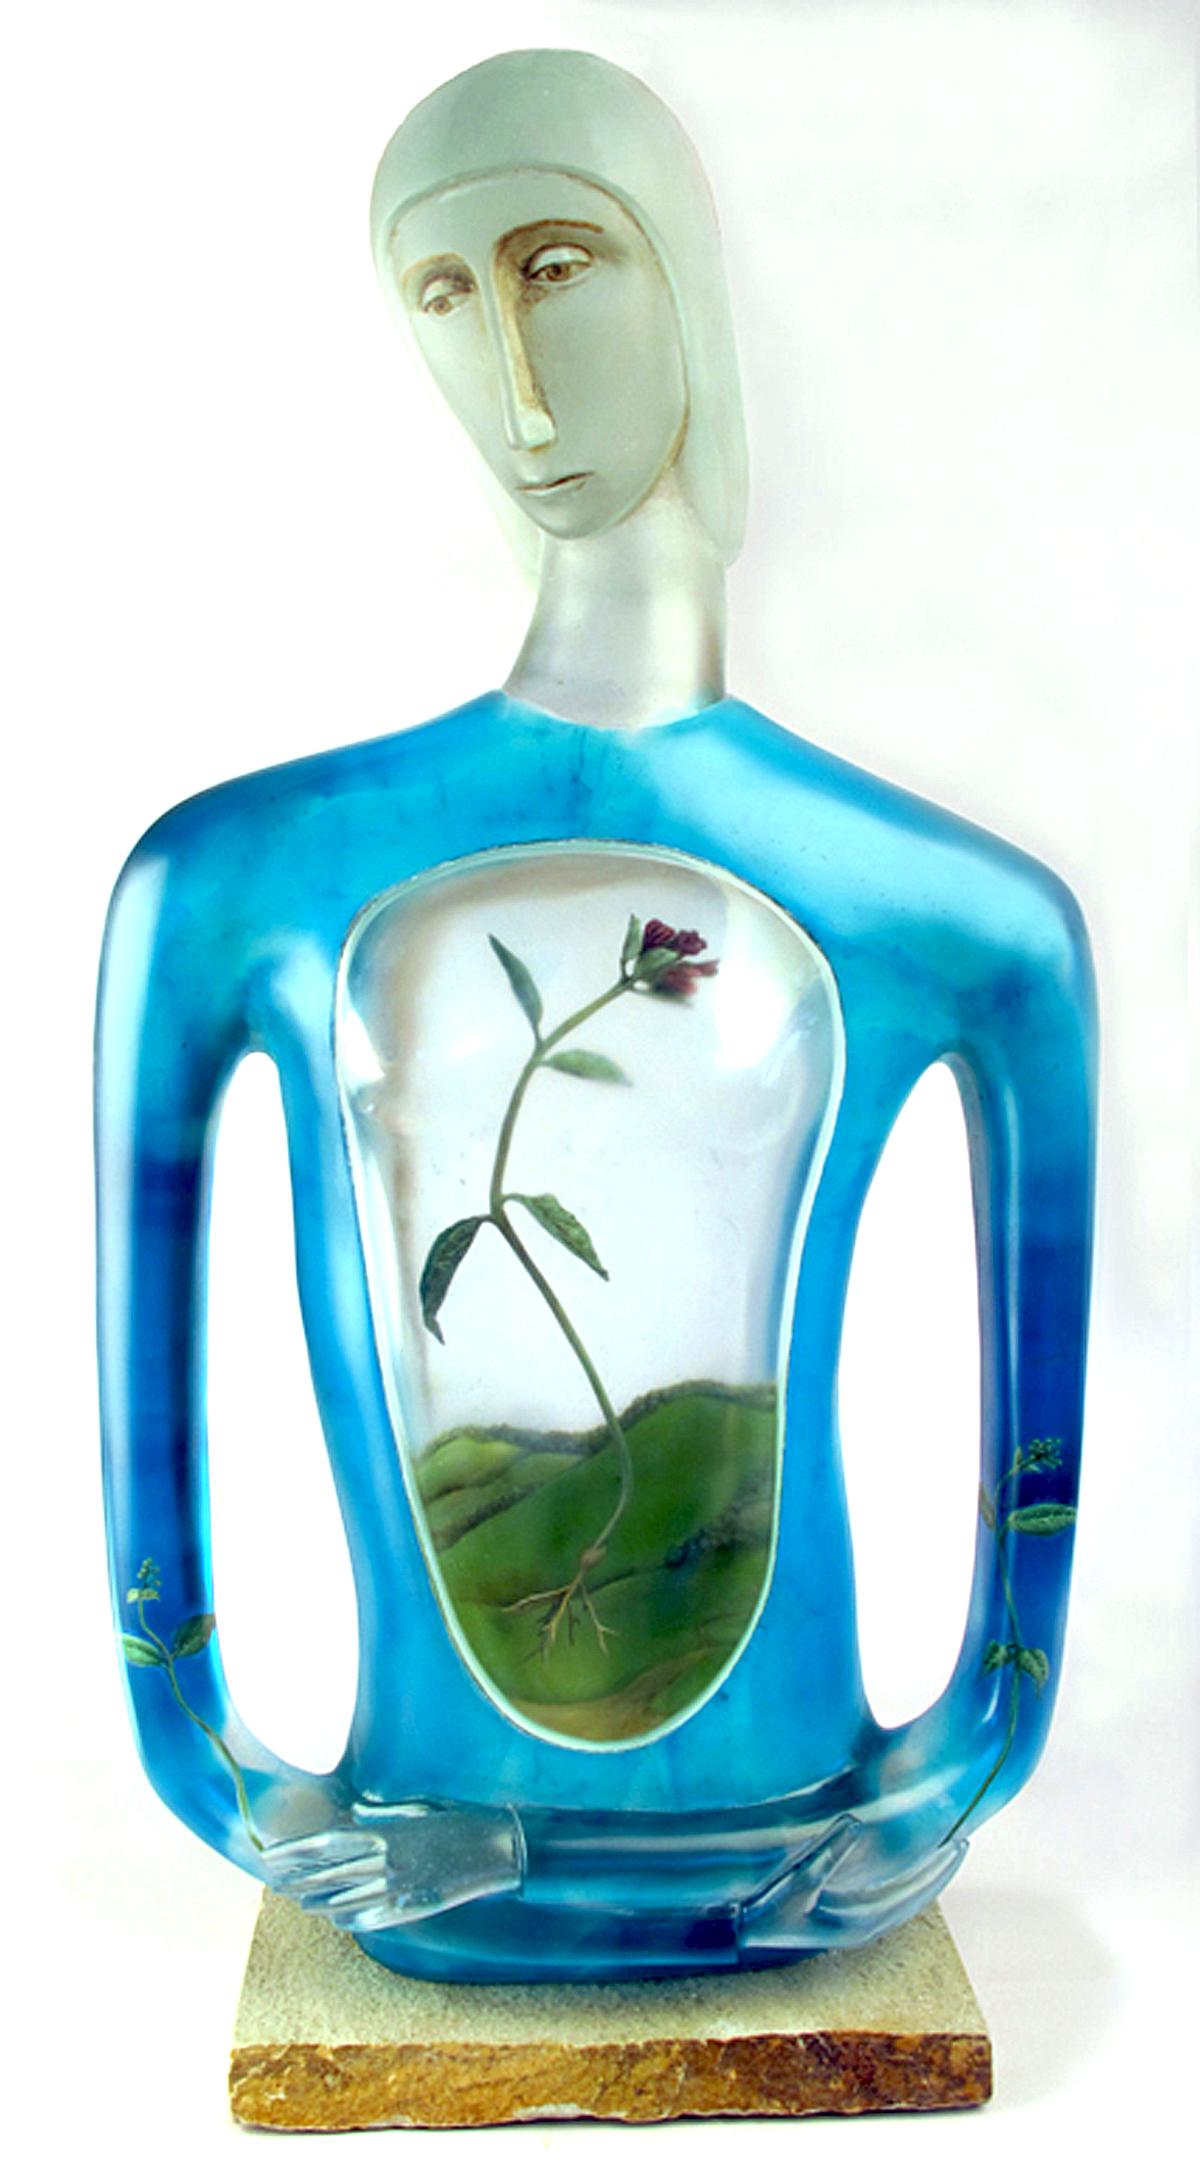 Cast glass figure by Robin Grebe